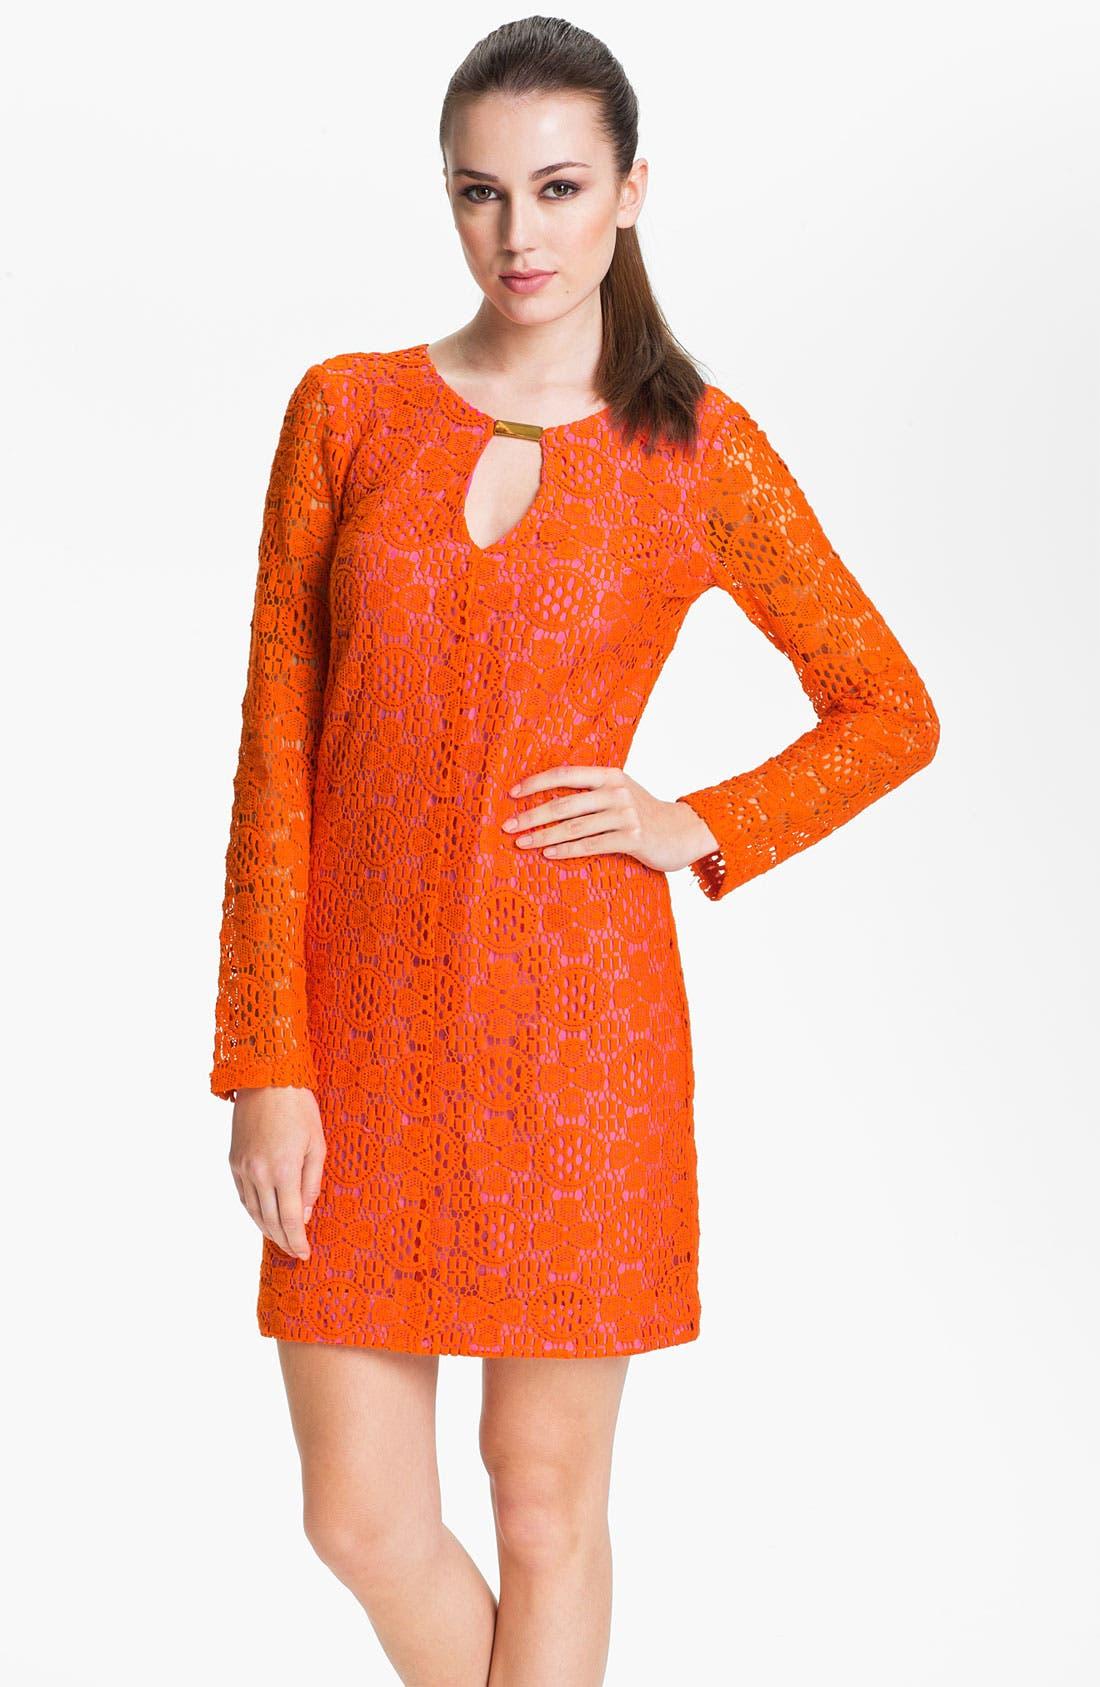 Alternate Image 1 Selected - Trina Turk 'Crandon' Keyhole Detail Lace Shift Dress